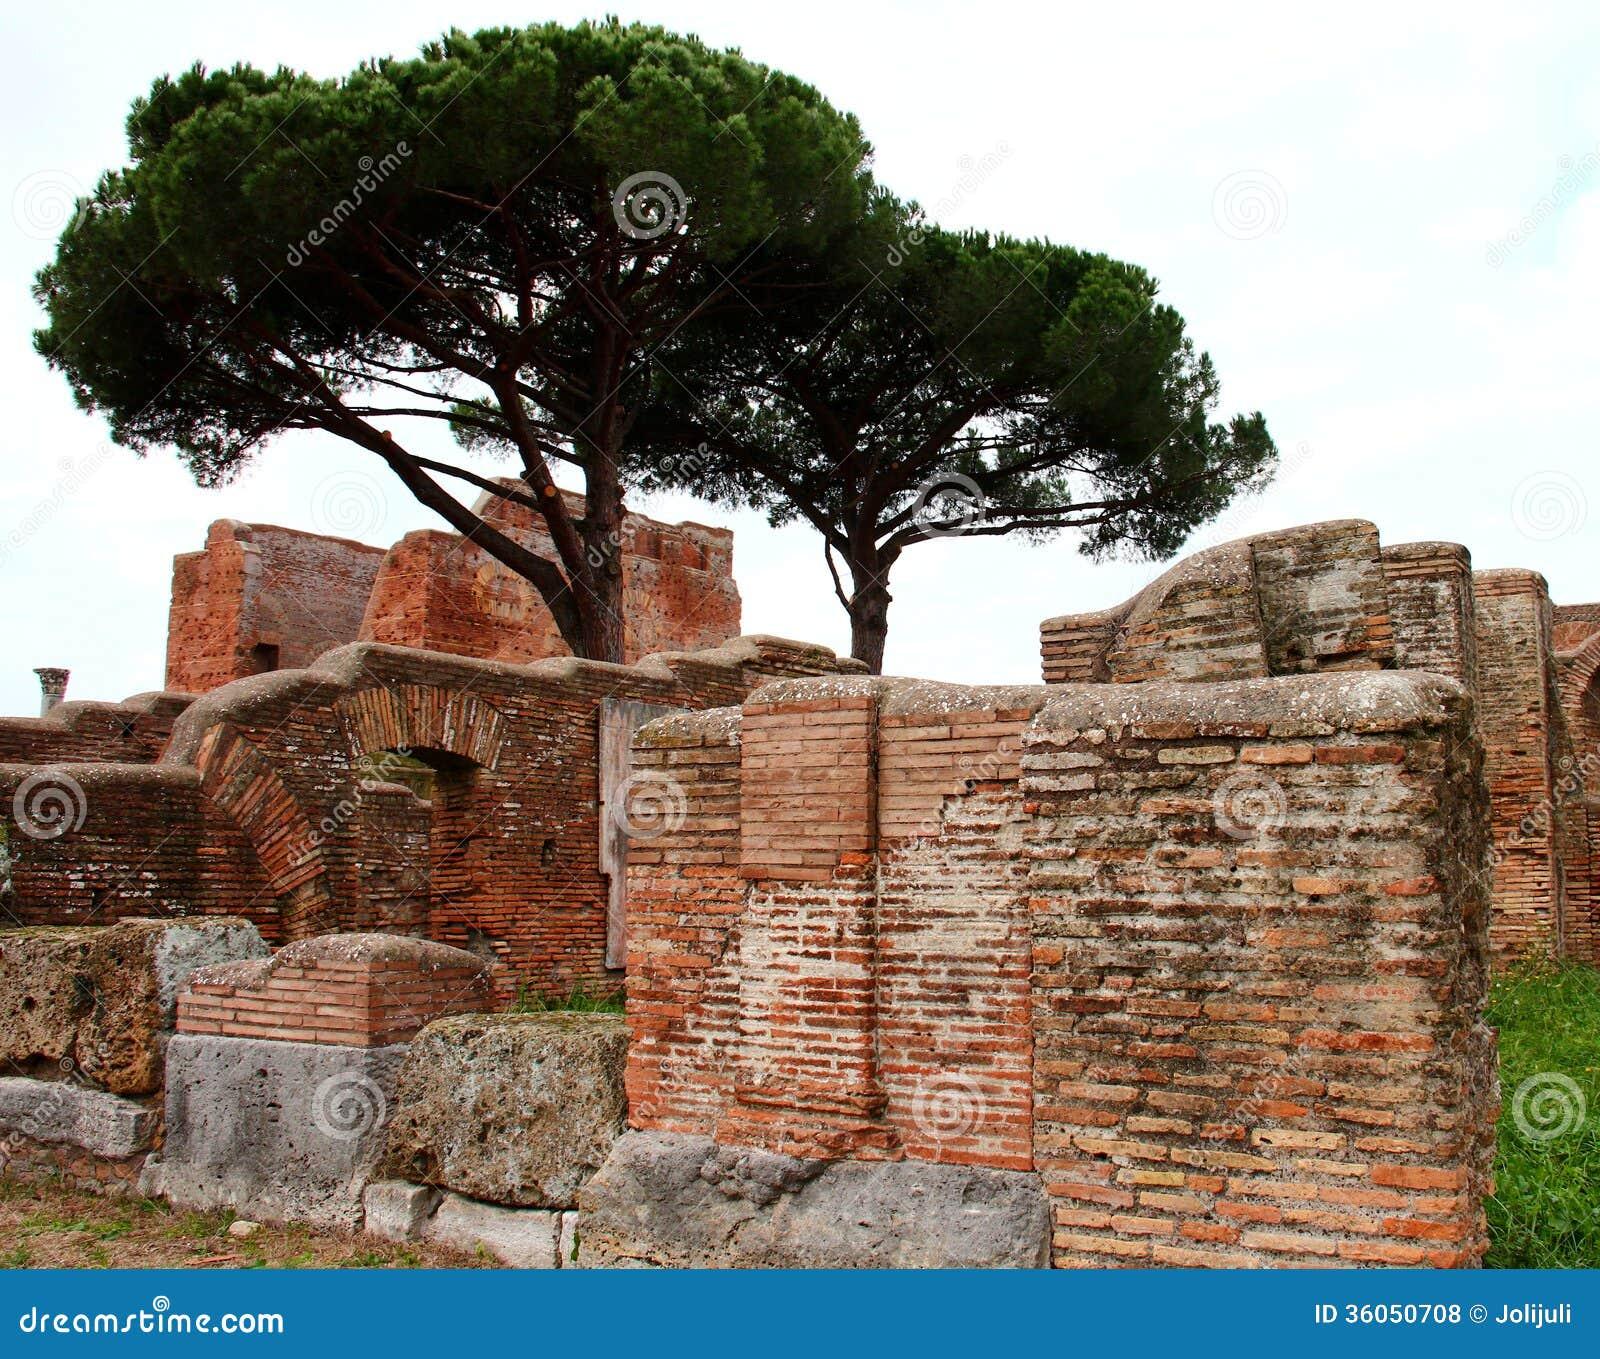 Ostia antica ruins royalty free stock photos image 36050708 for Mr arredamenti ostia antica